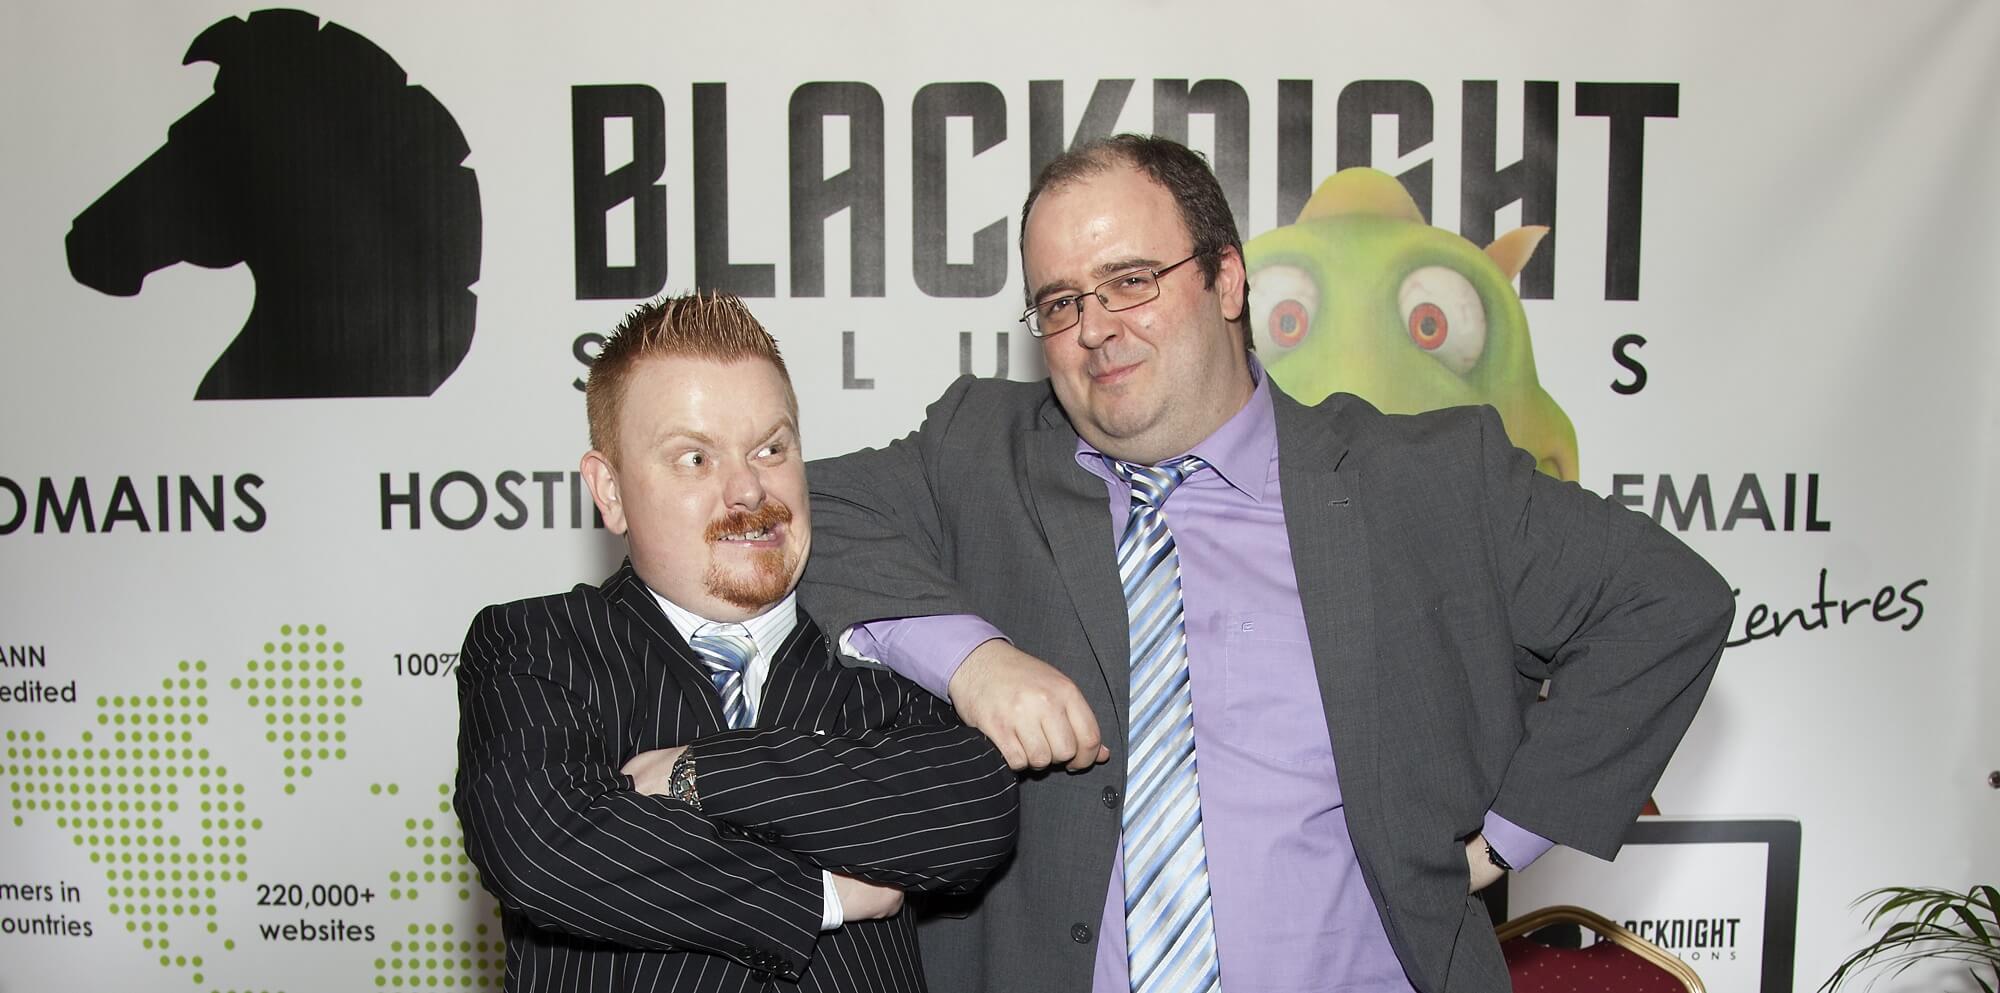 Why Blacknight Backs Fadas in IE Domain